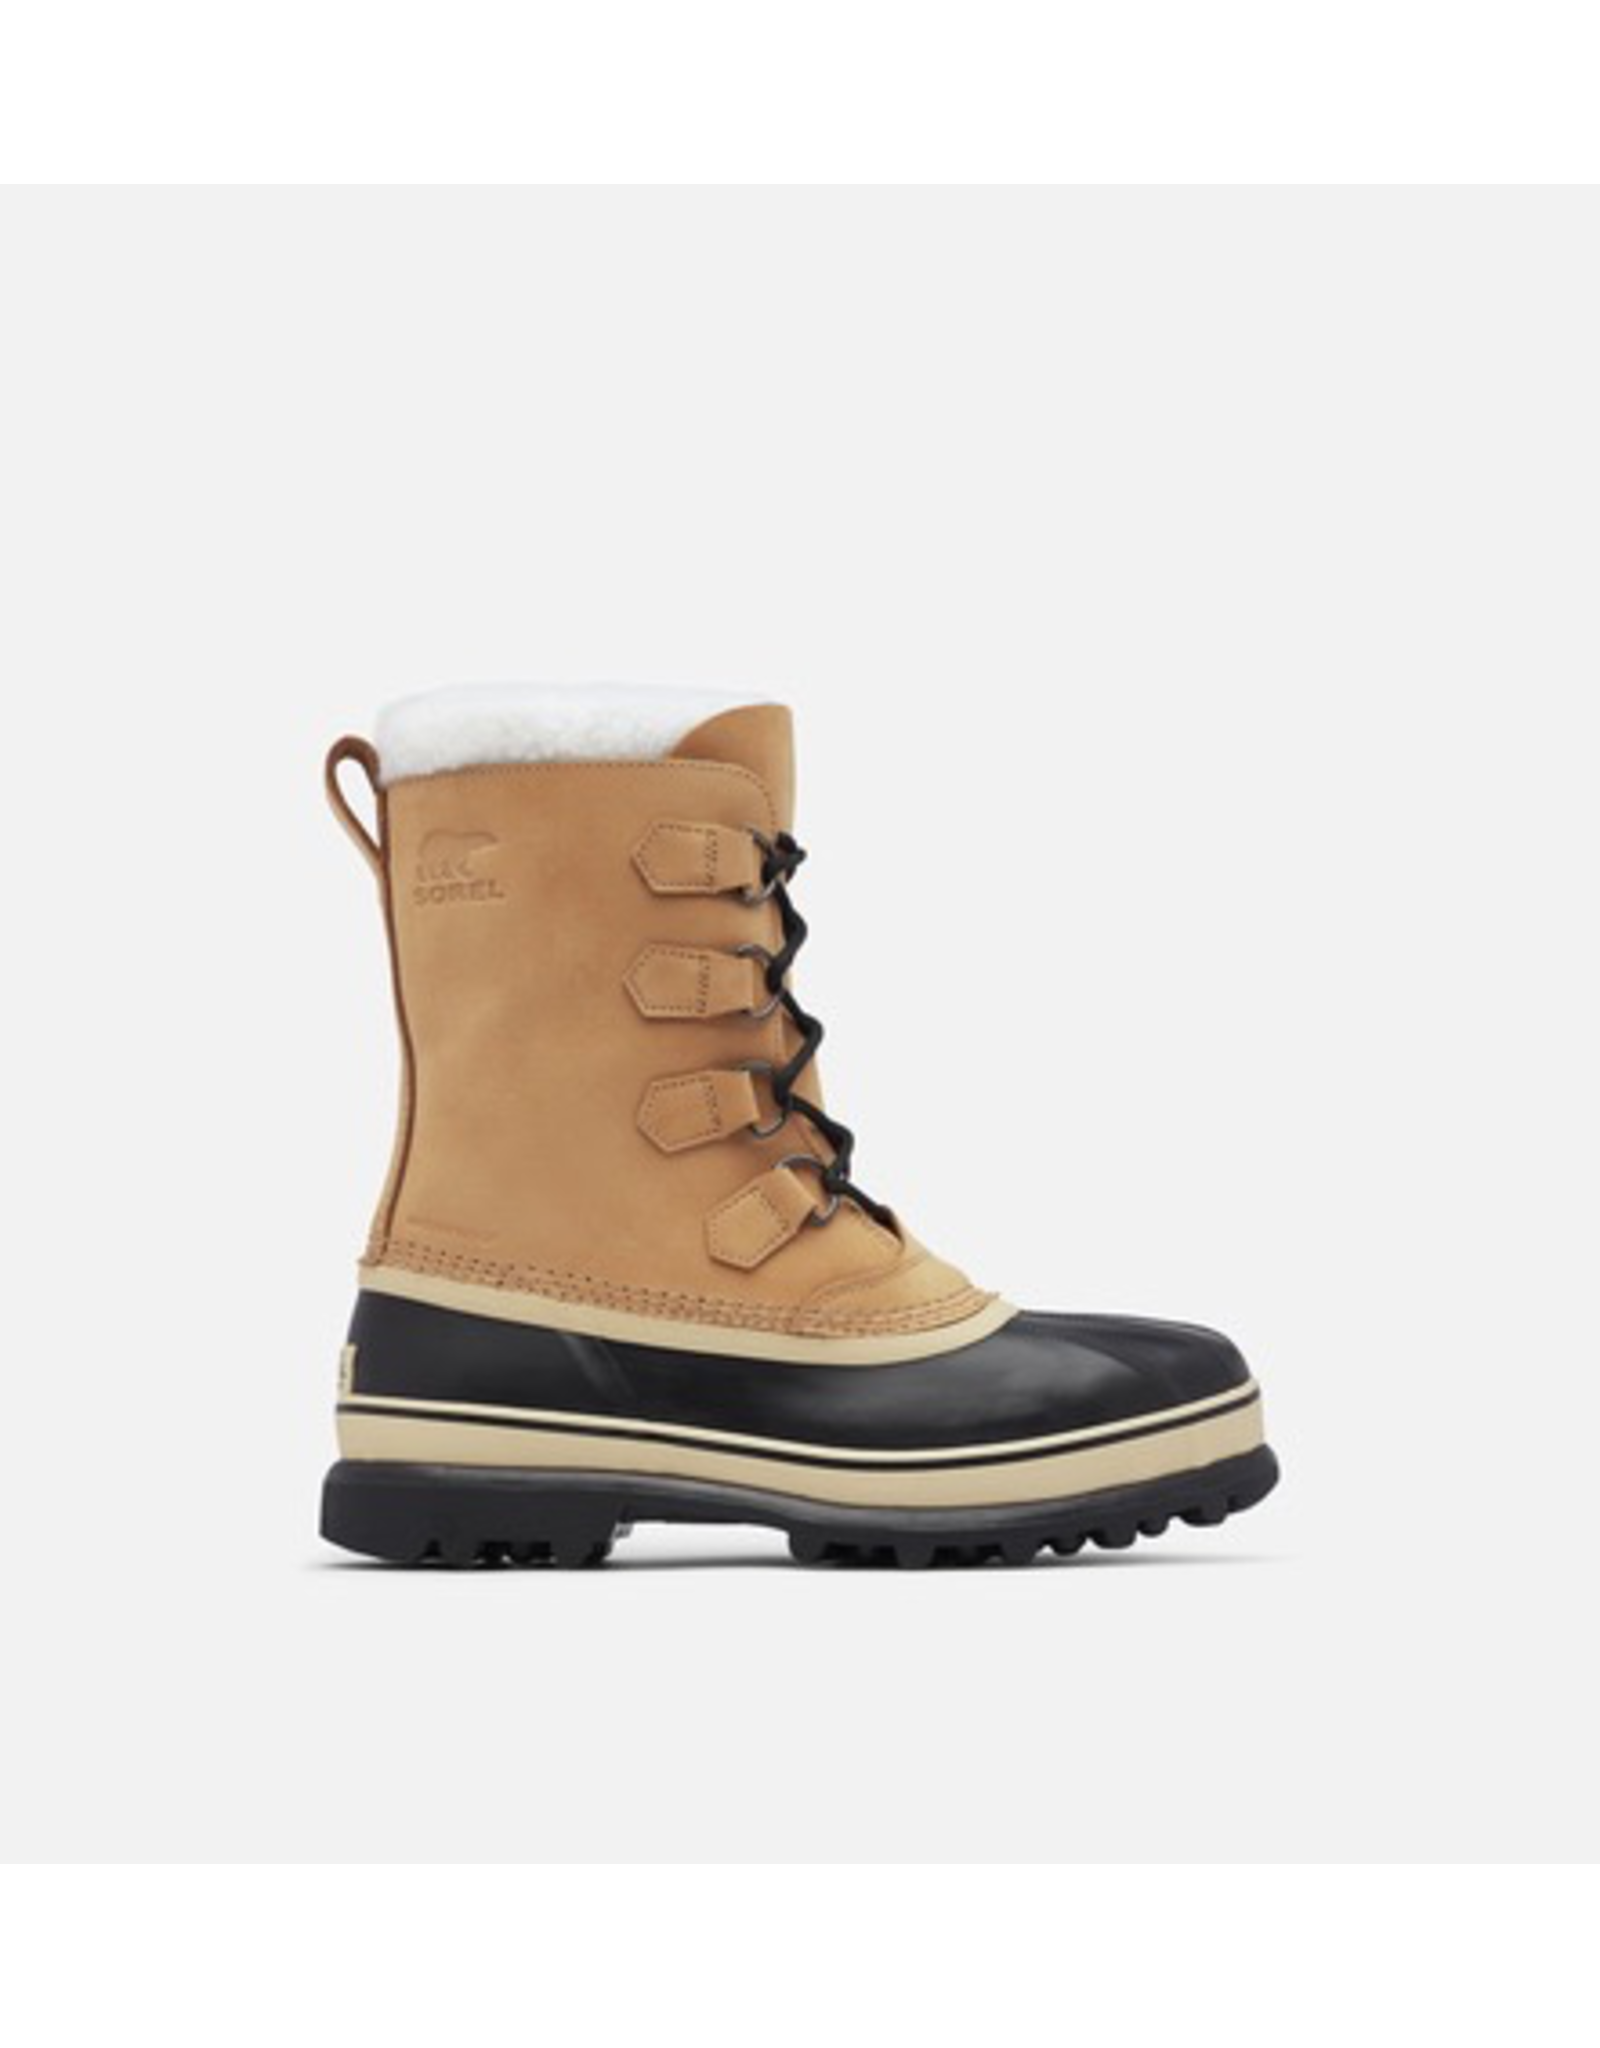 Sorel Sorel men's Caribou Boot